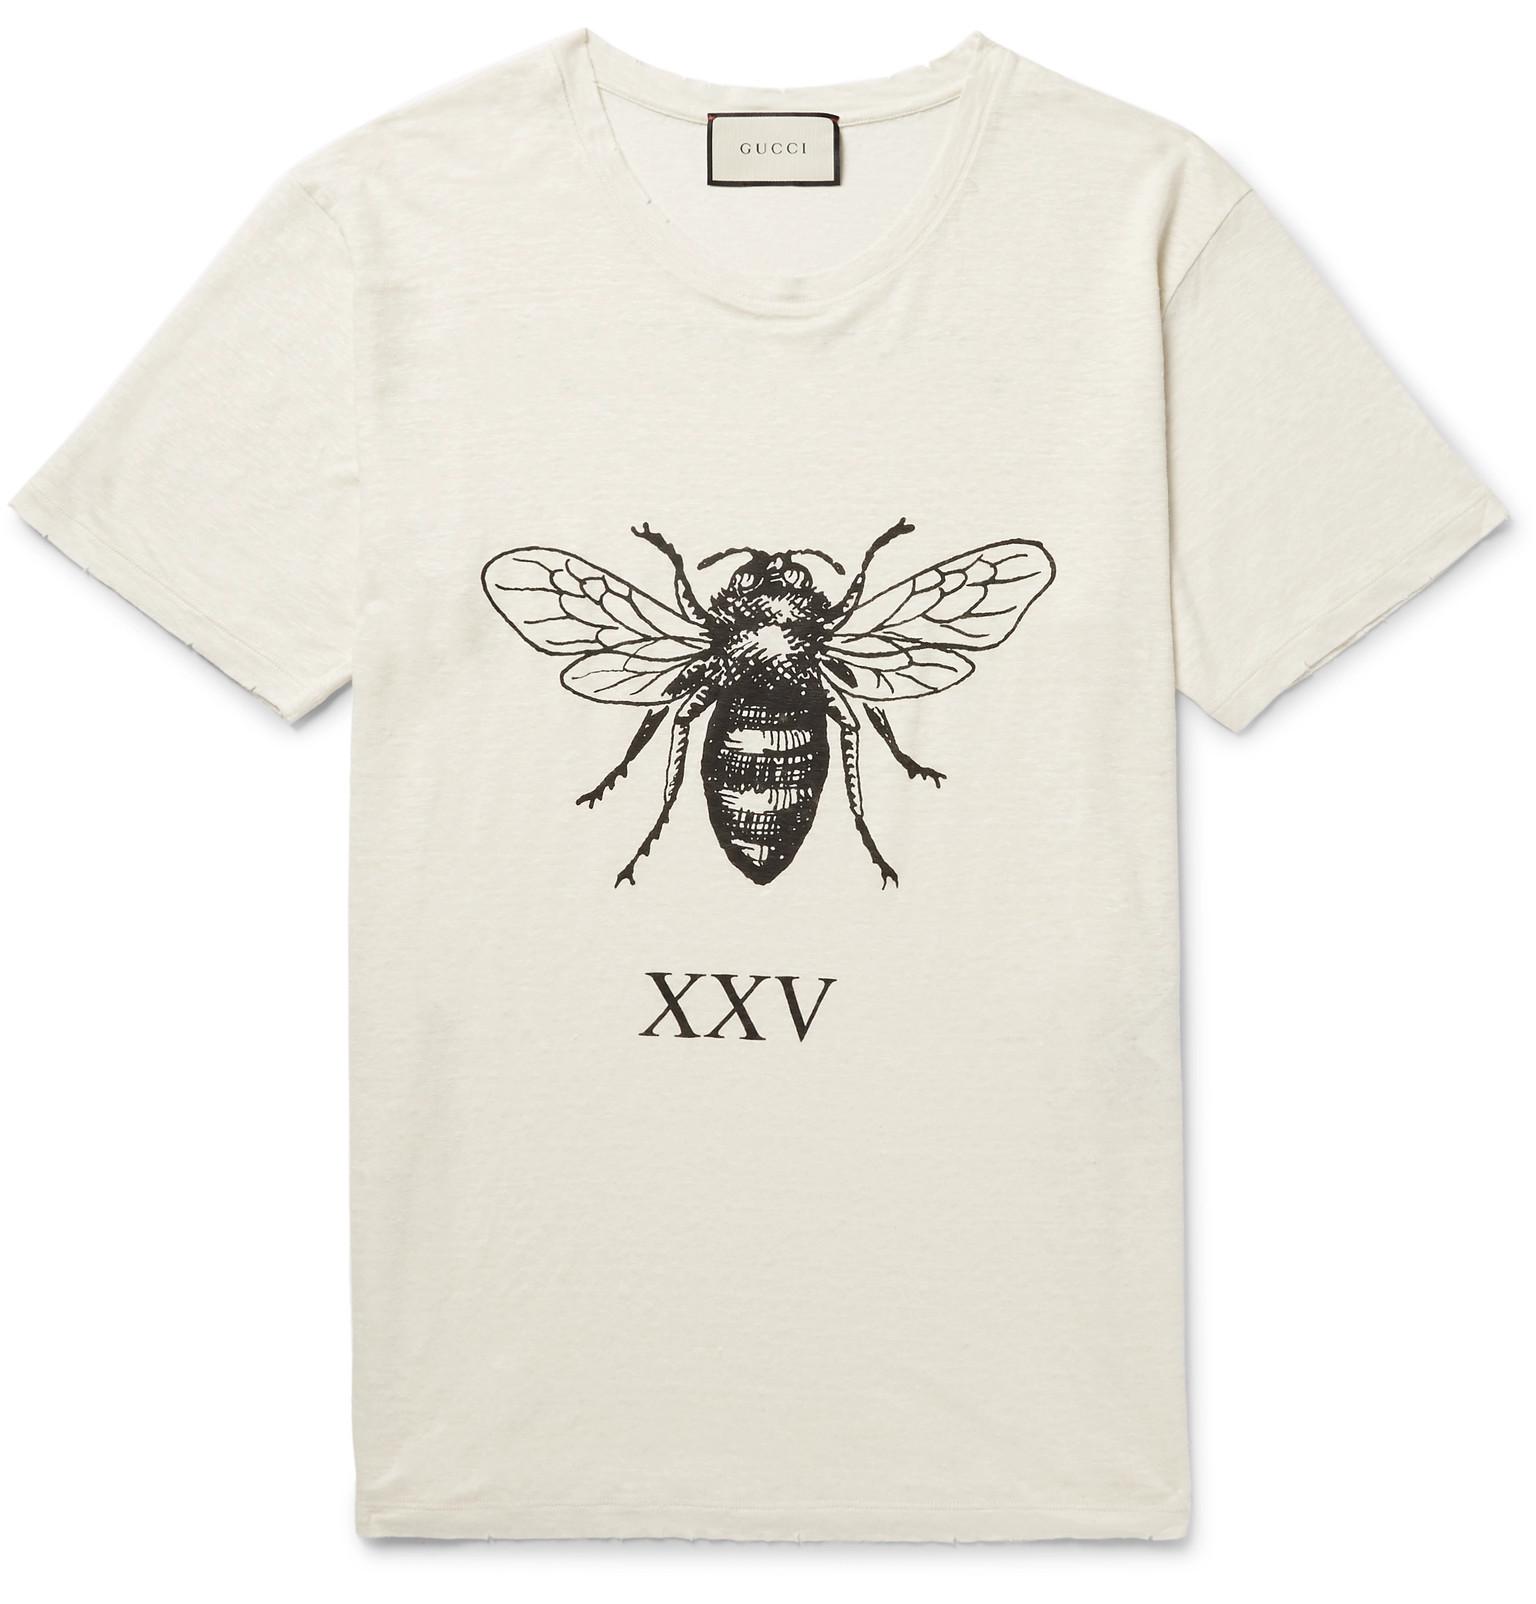 gucci t shirt. gucci distressed printed slub linen t-shirt t shirt